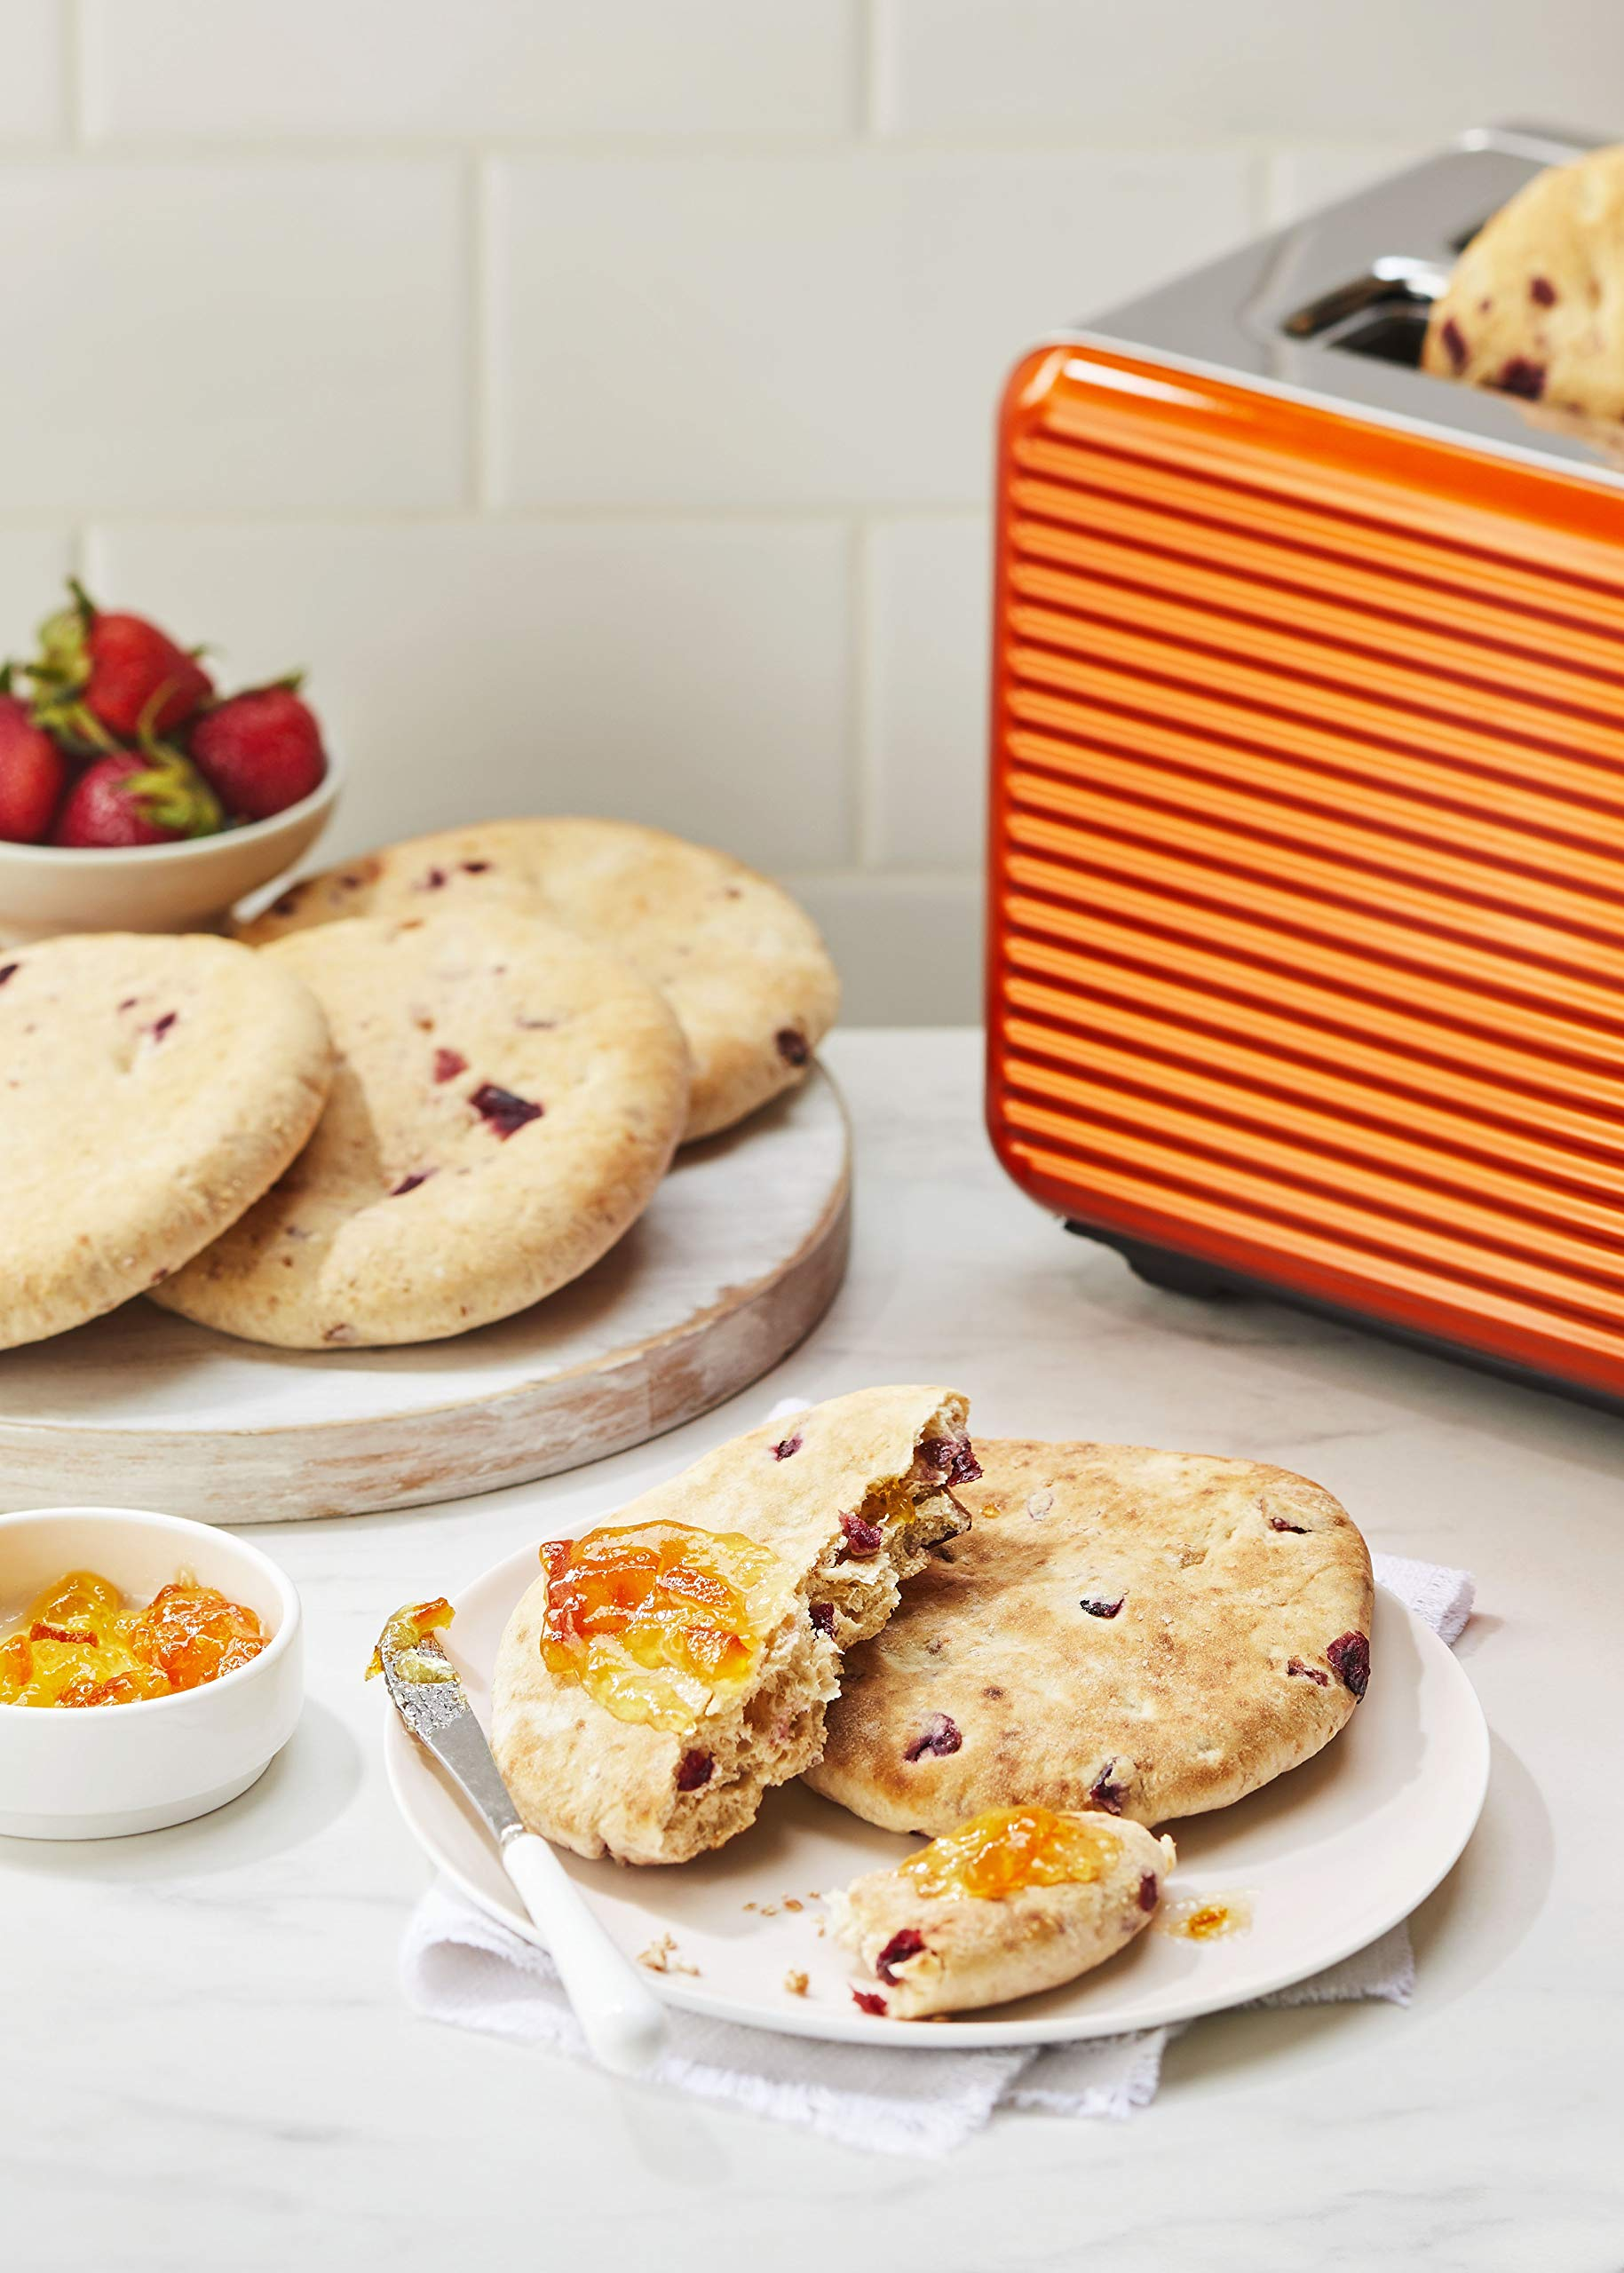 OZERY BAKERY Morning Round Pita Bread, Cranberry Orange, 12.7 Ounce (Pack of 6) by Ozery Bakery Inc. (Image #5)